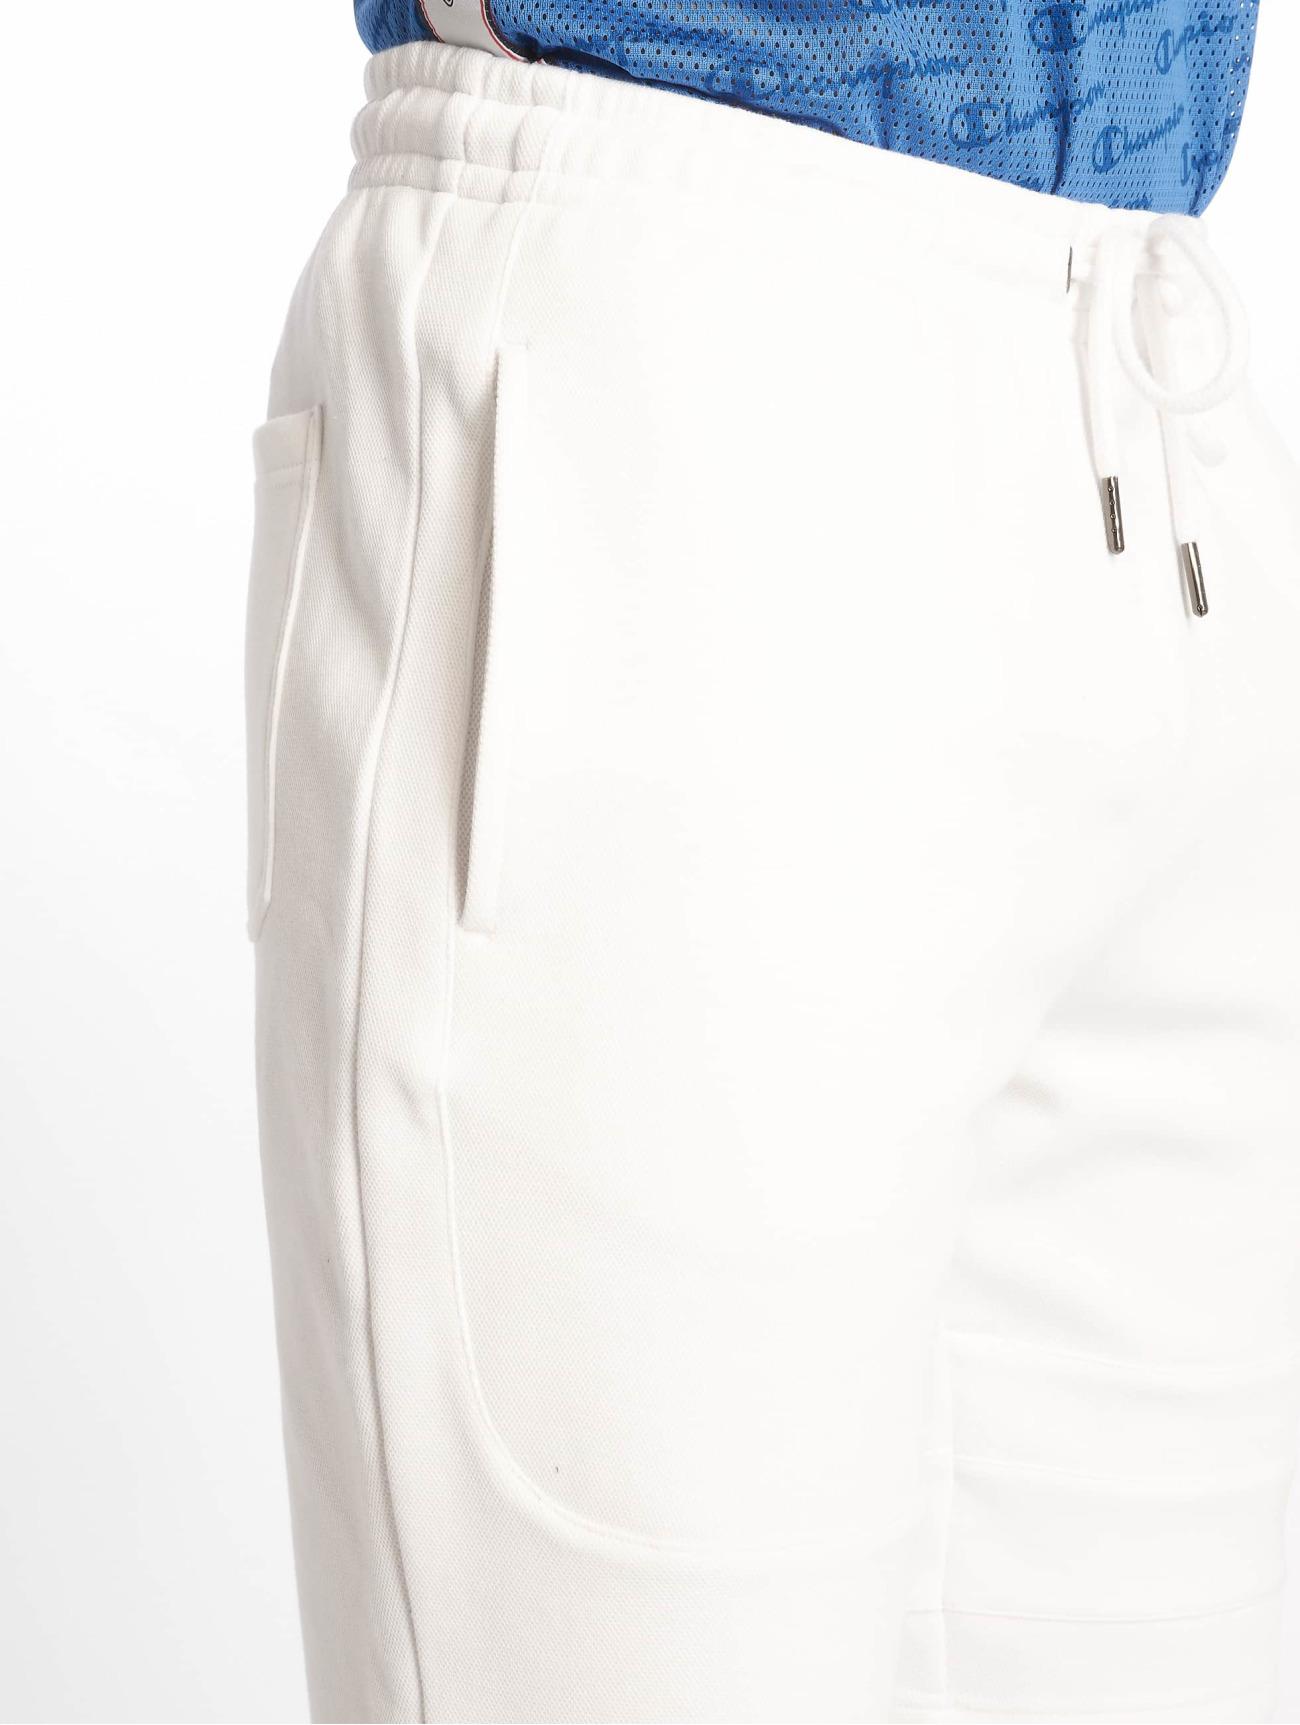 Urban Classics  Heavy Pique  blanc Homme Short  636187 Homme Pantalons & Shorts